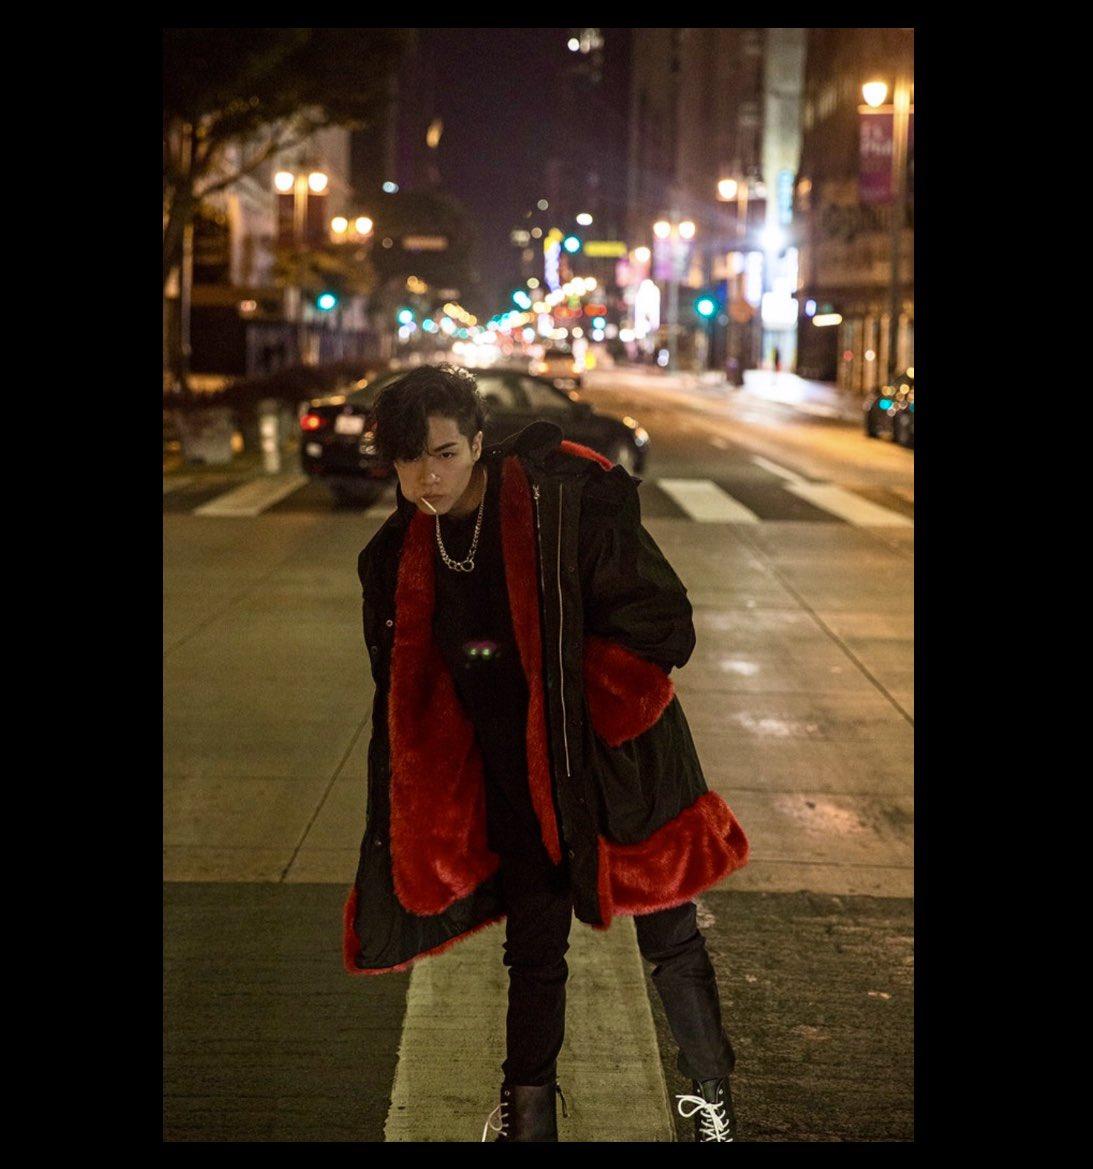 Shot Kazuma Kawamura for 1st phot book at LA #rampage #exiletribe #ランページフロムexiletribe #川村壱馬 #ロサンゼルス #kazumakawamura #ランページ  #portraitphotography #sincere #6.23out #幻冬舎pic.twitter.com/7ehQnYjTps